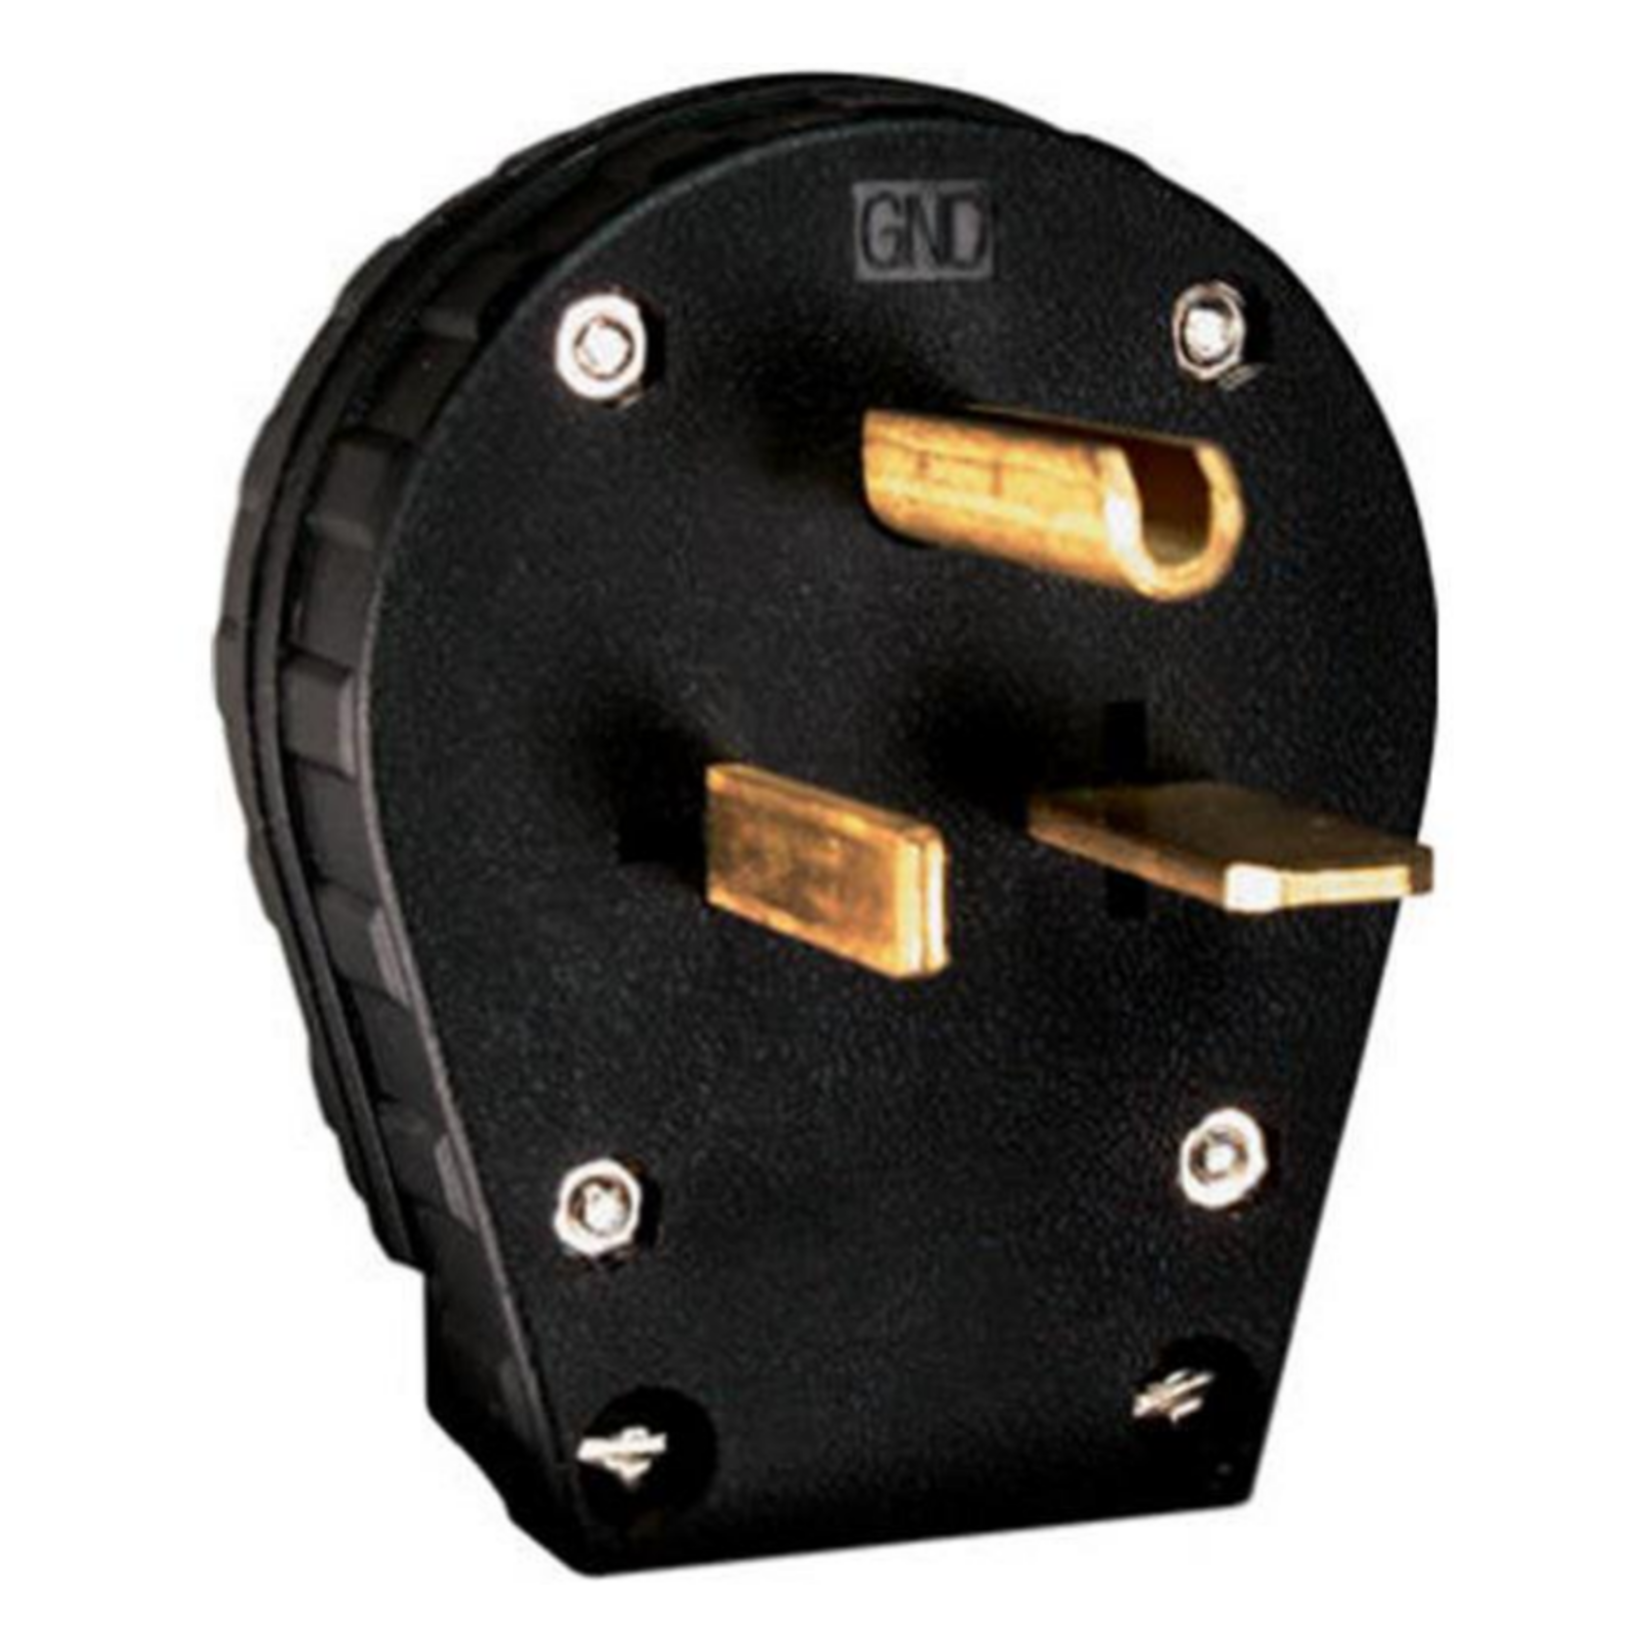 10107 Pass & Seymour Heavy Duty Dual Power Angle Plug